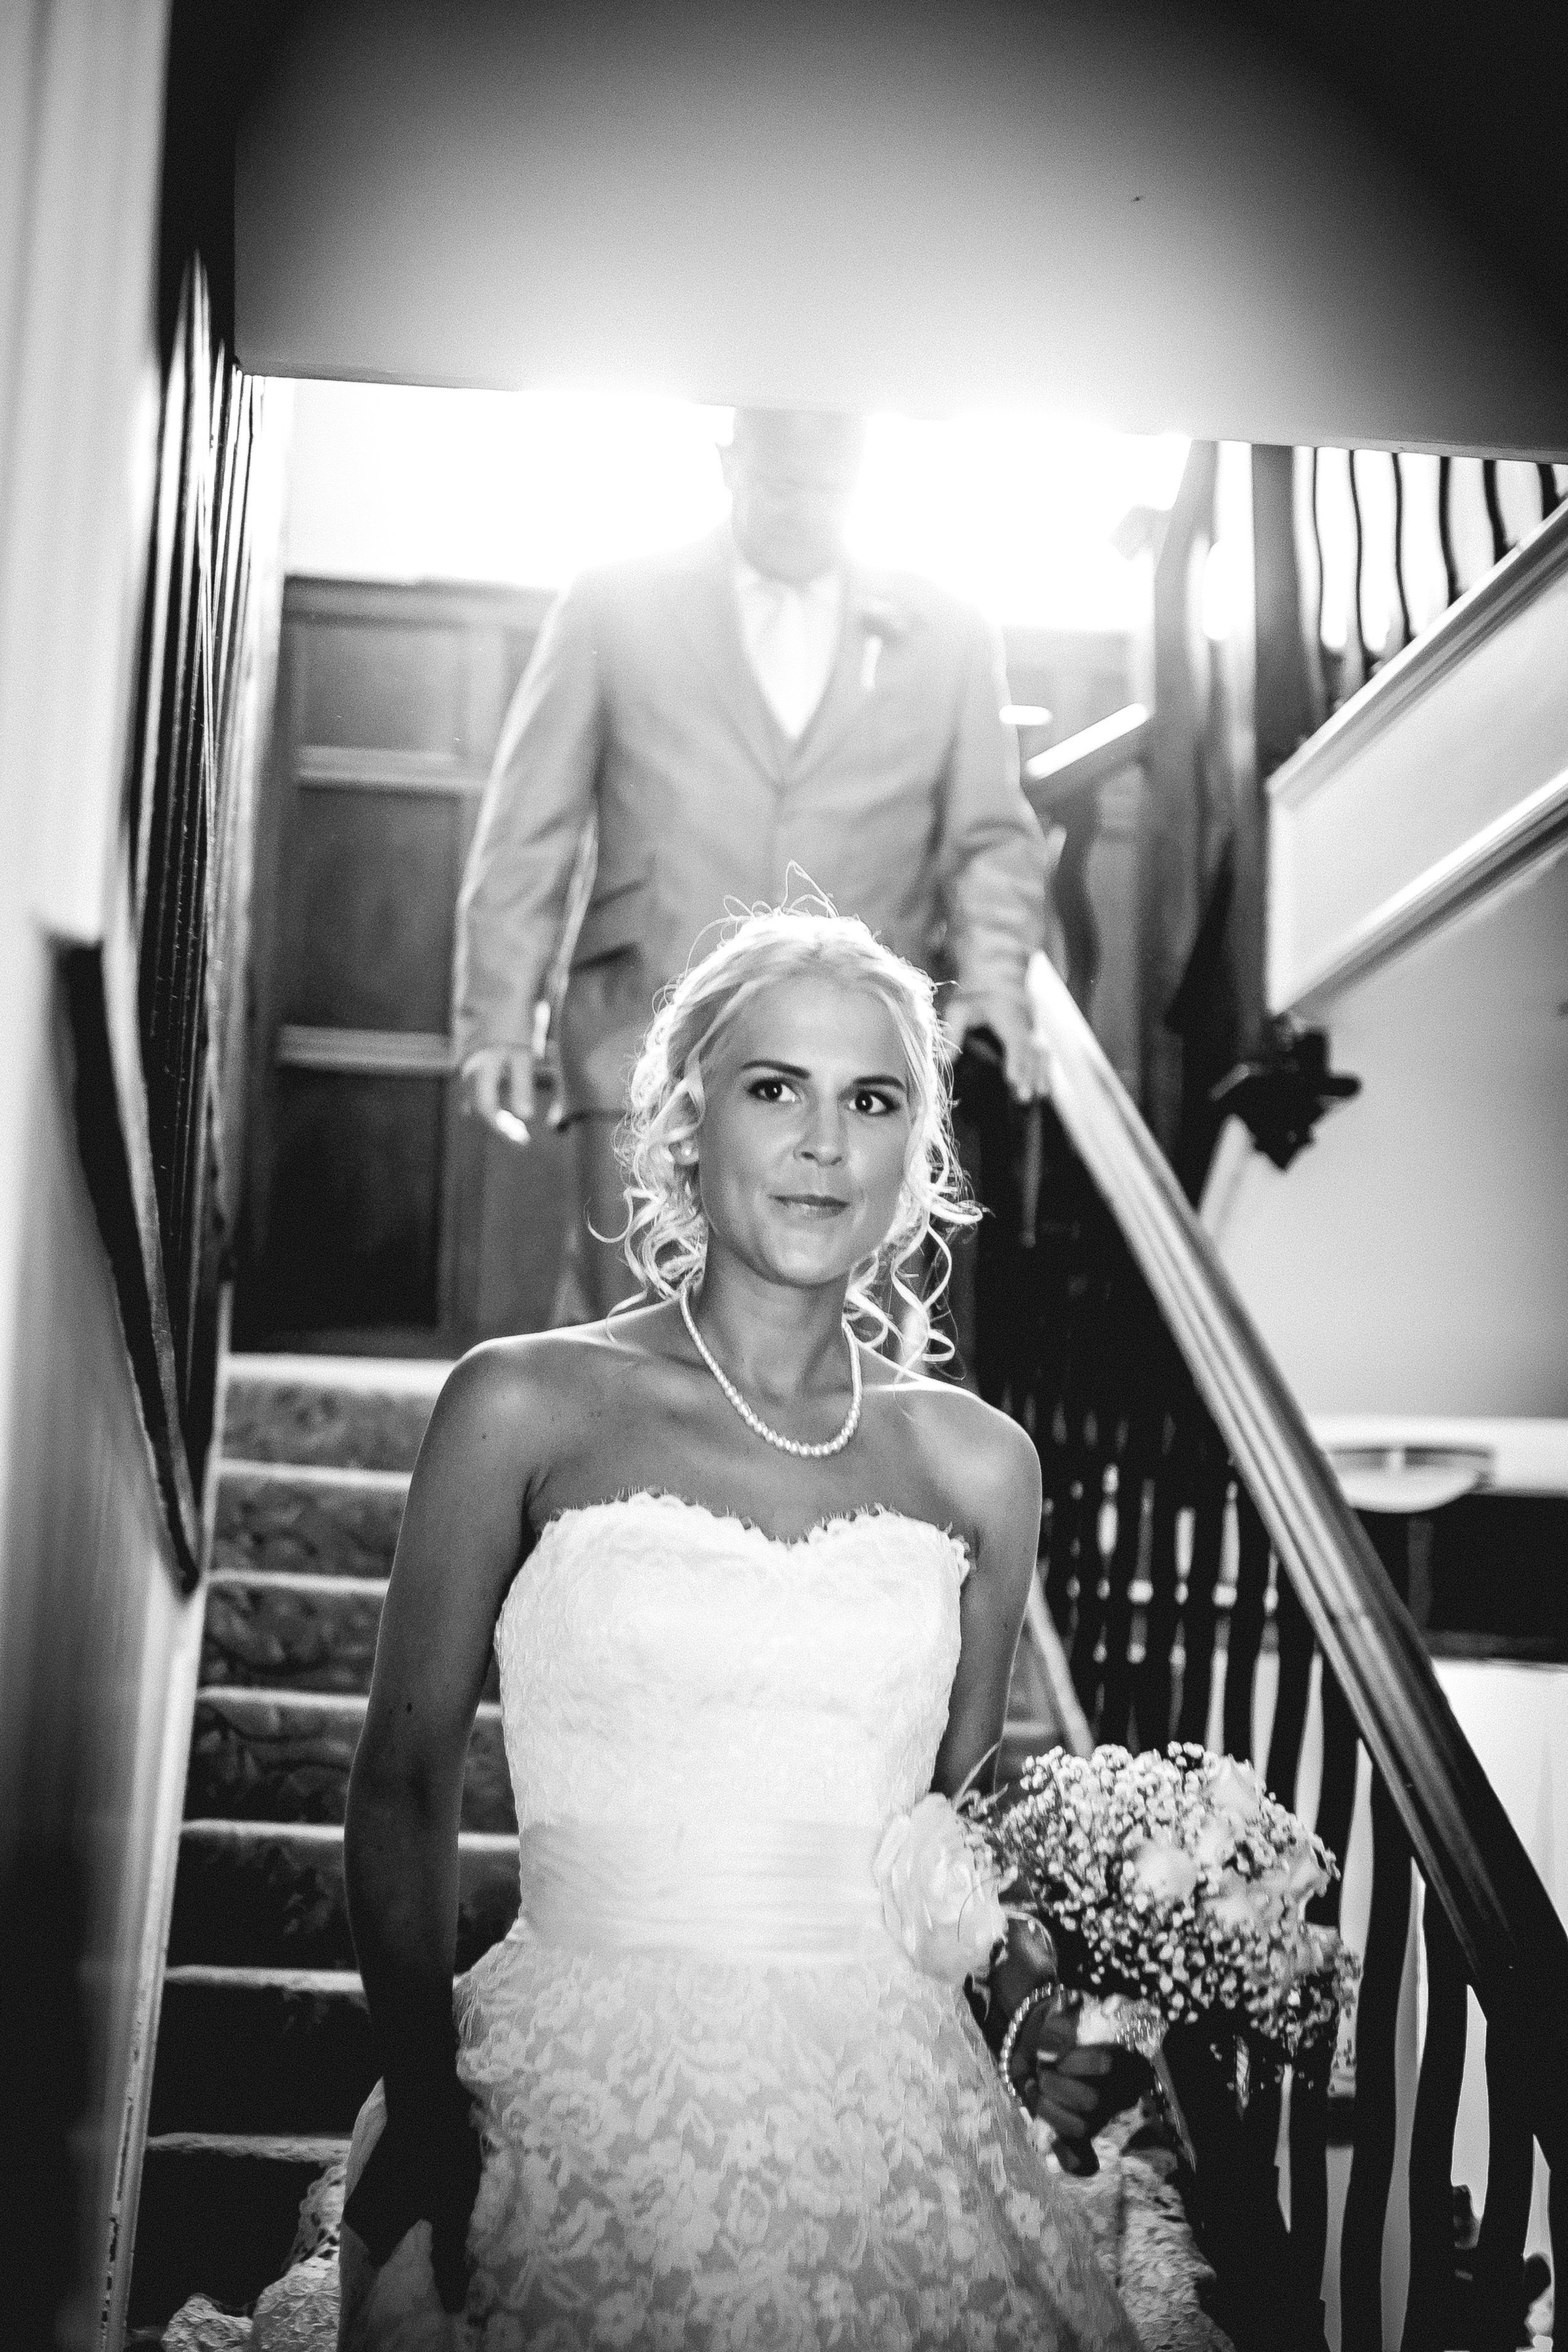 A Monmouth Wedding. | Fuji XE1 | 35mm | F1.4 - 1/80th - iso1600